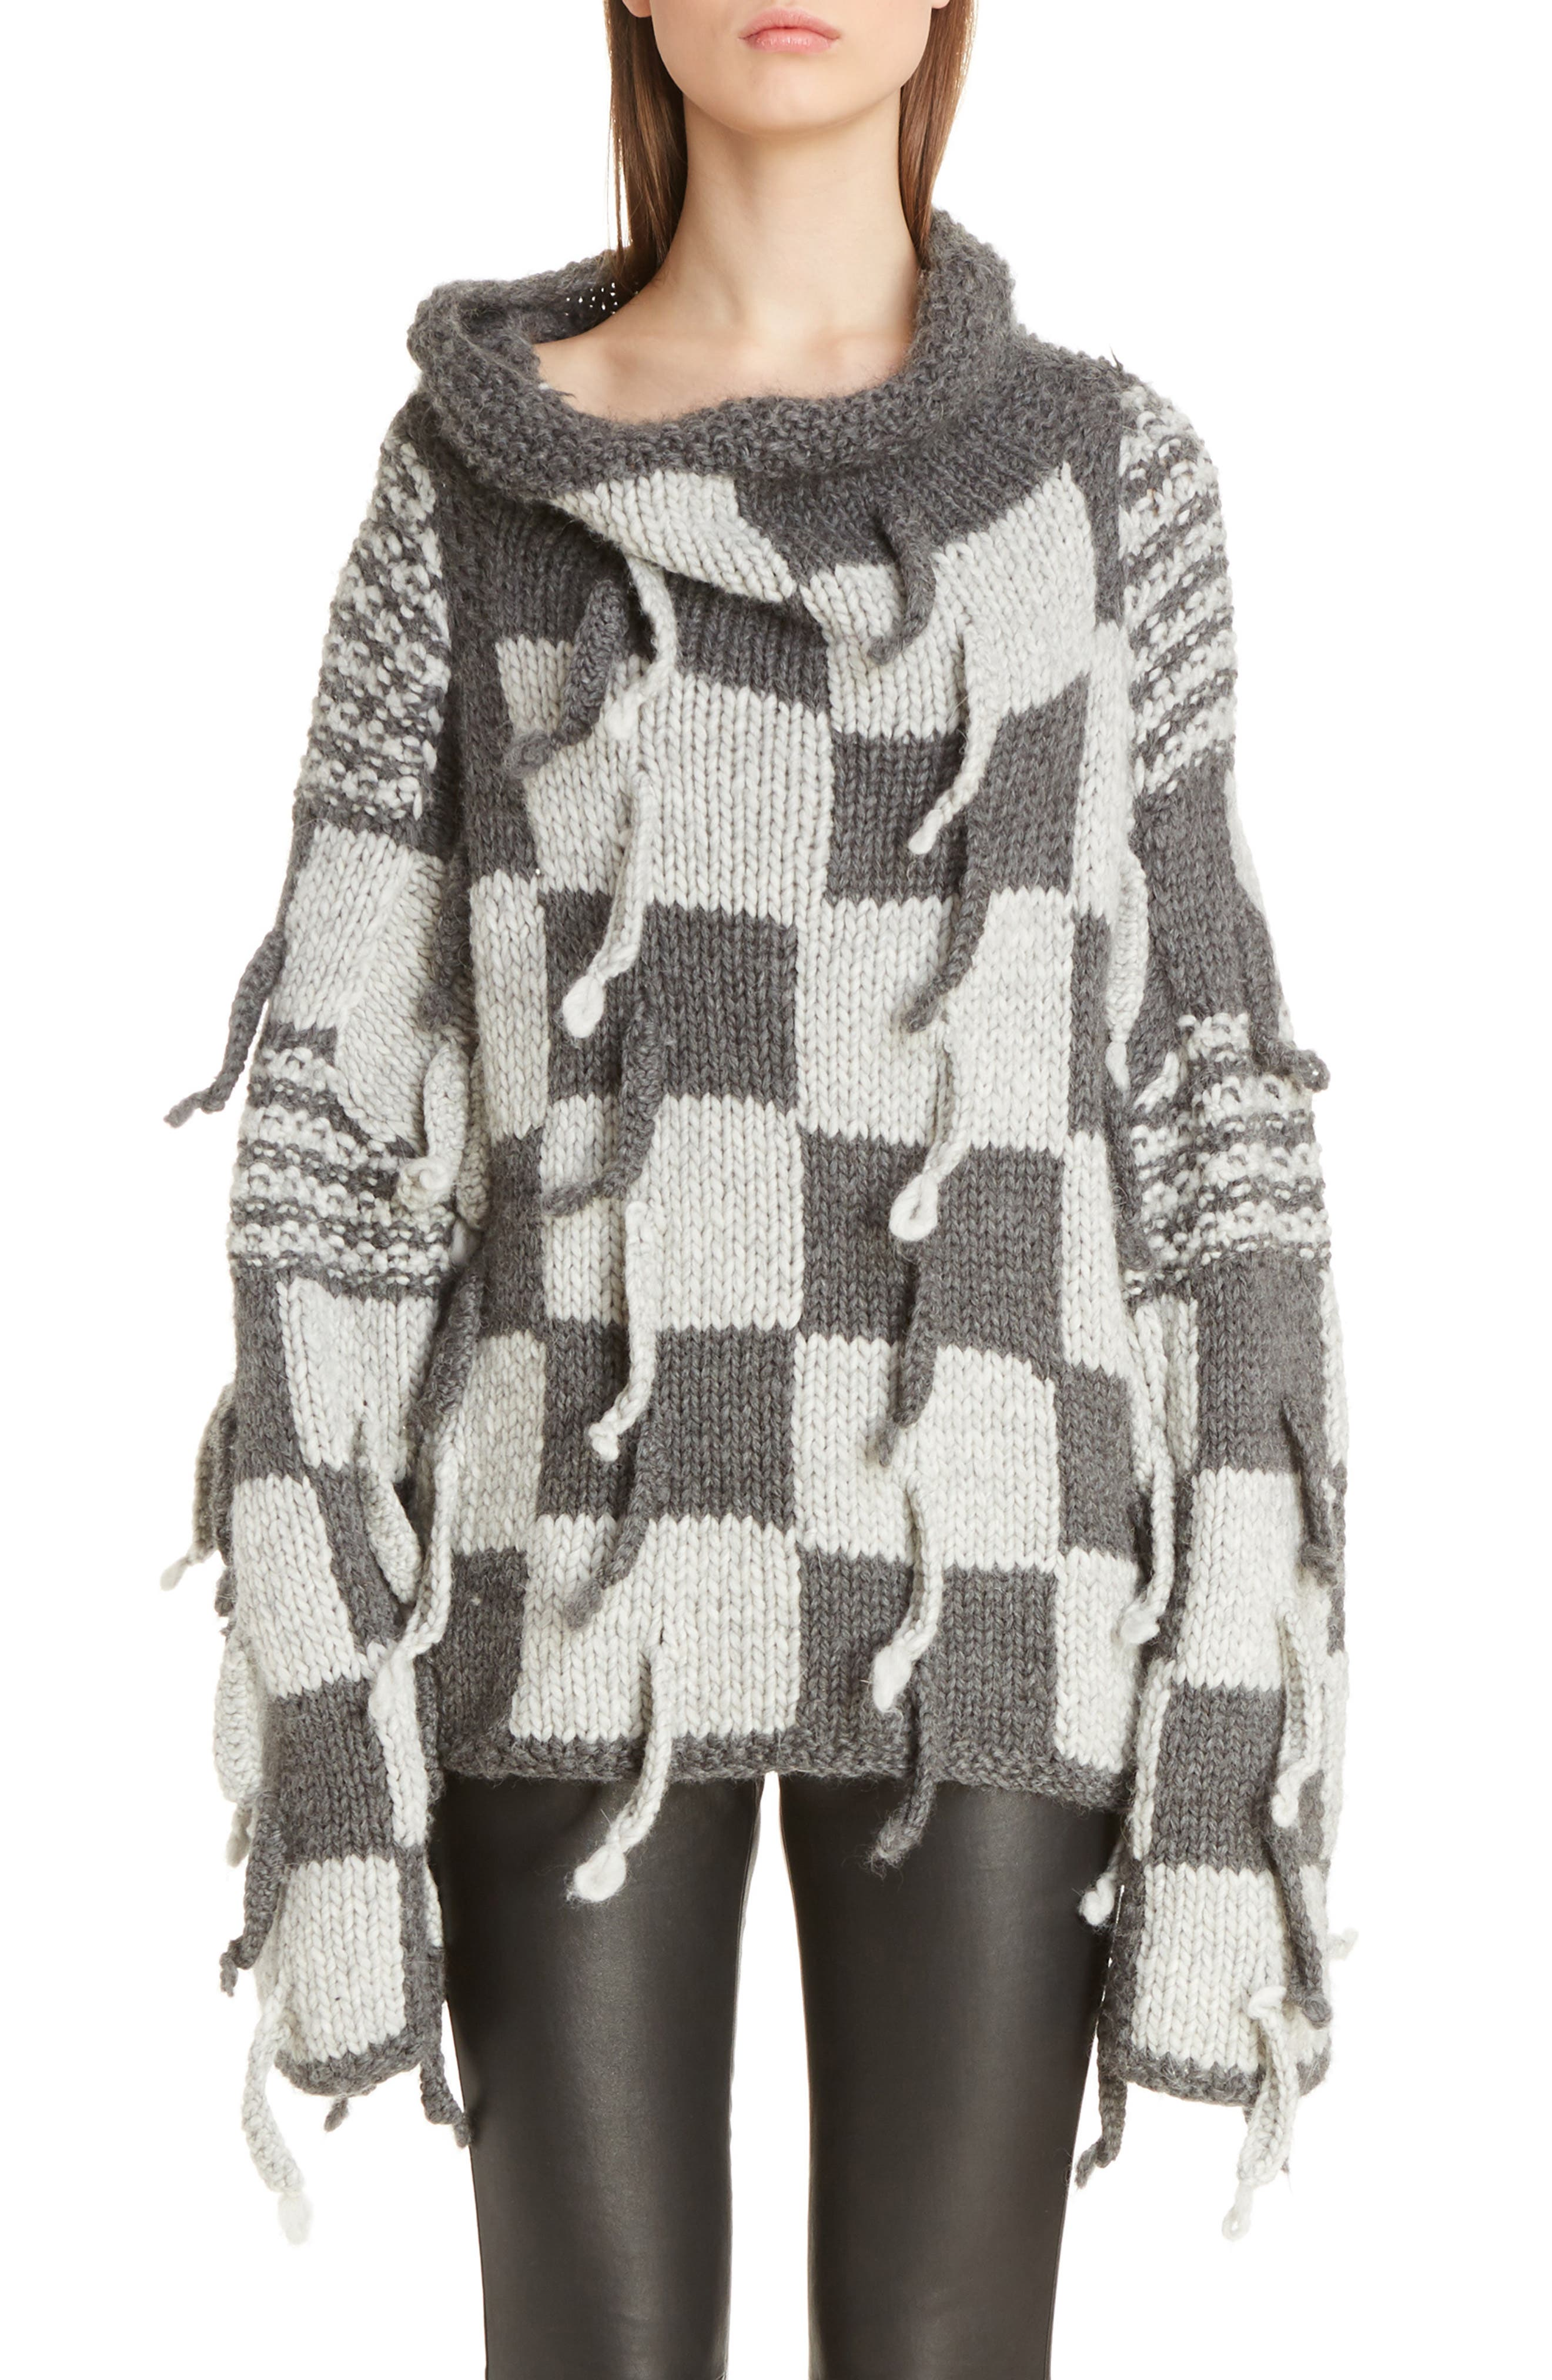 Chunky Knit Wool & Alpaca Sweater,                         Main,                         color, Dark Grey/ Light Grey